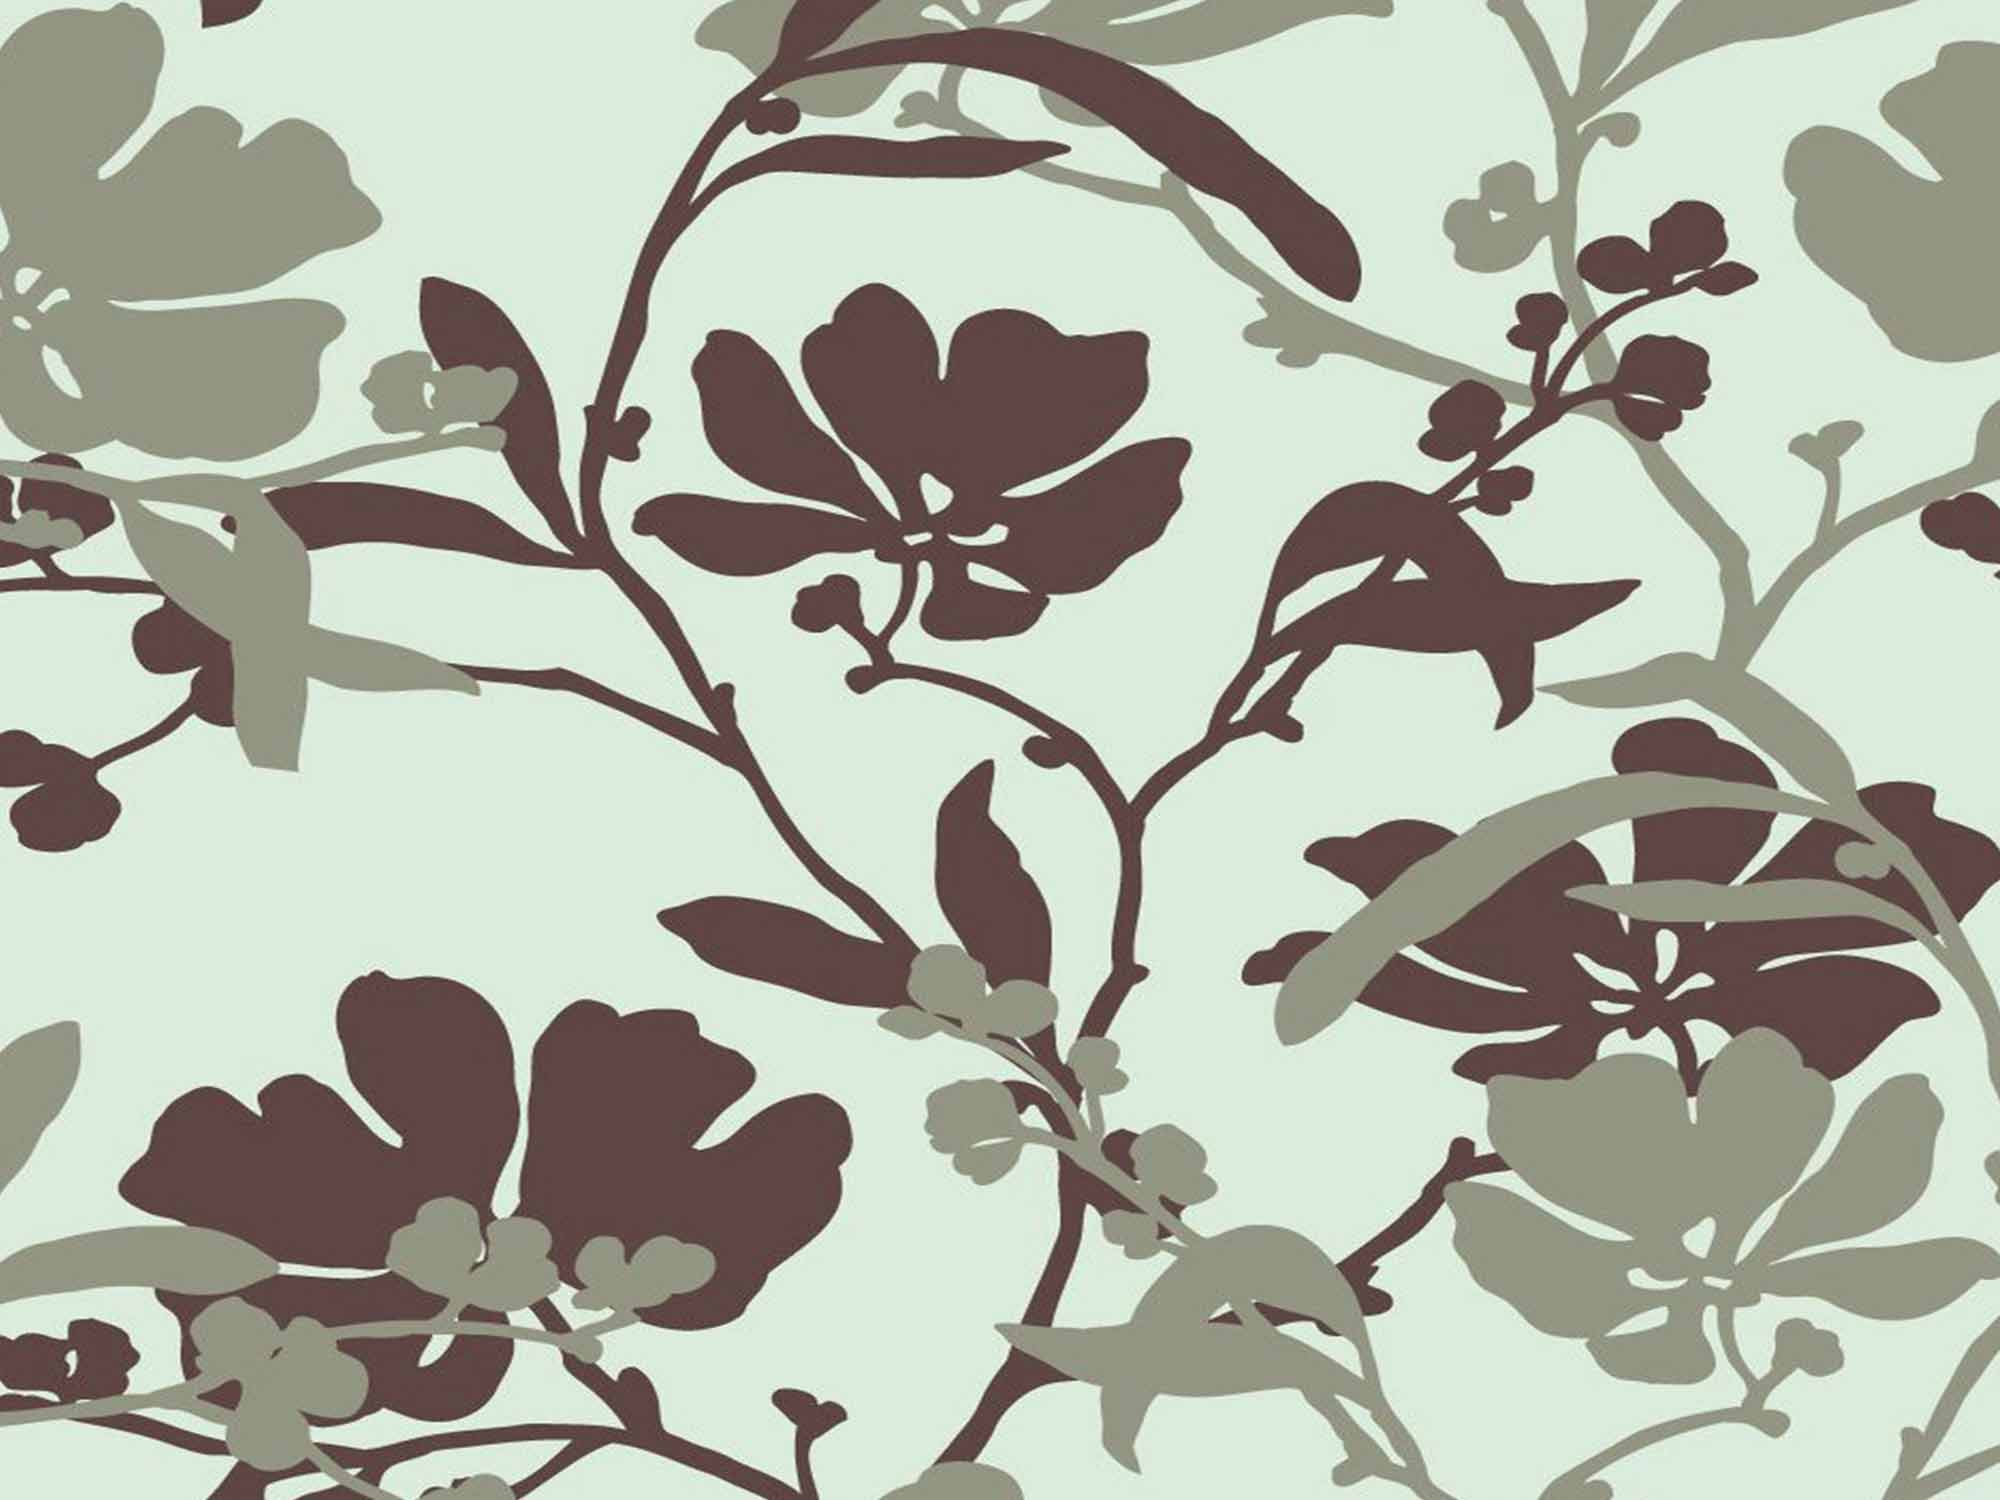 Papel de Parede Floral 0094 - Adesivos de Parede  - Paredes Decoradas